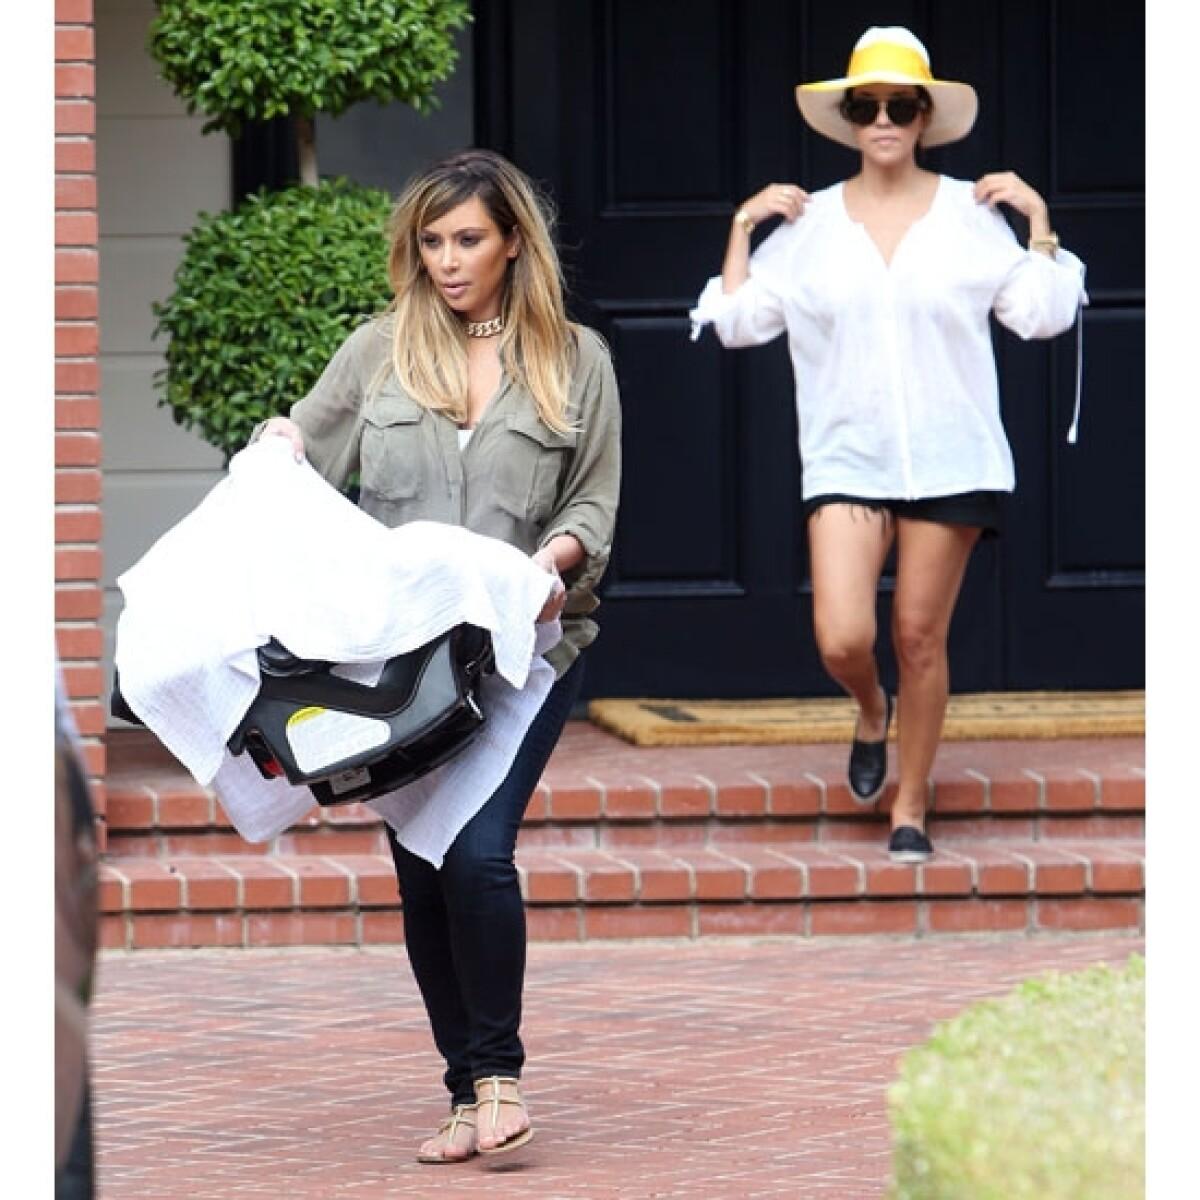 Así es, Kim Kardashian ahora es rubia